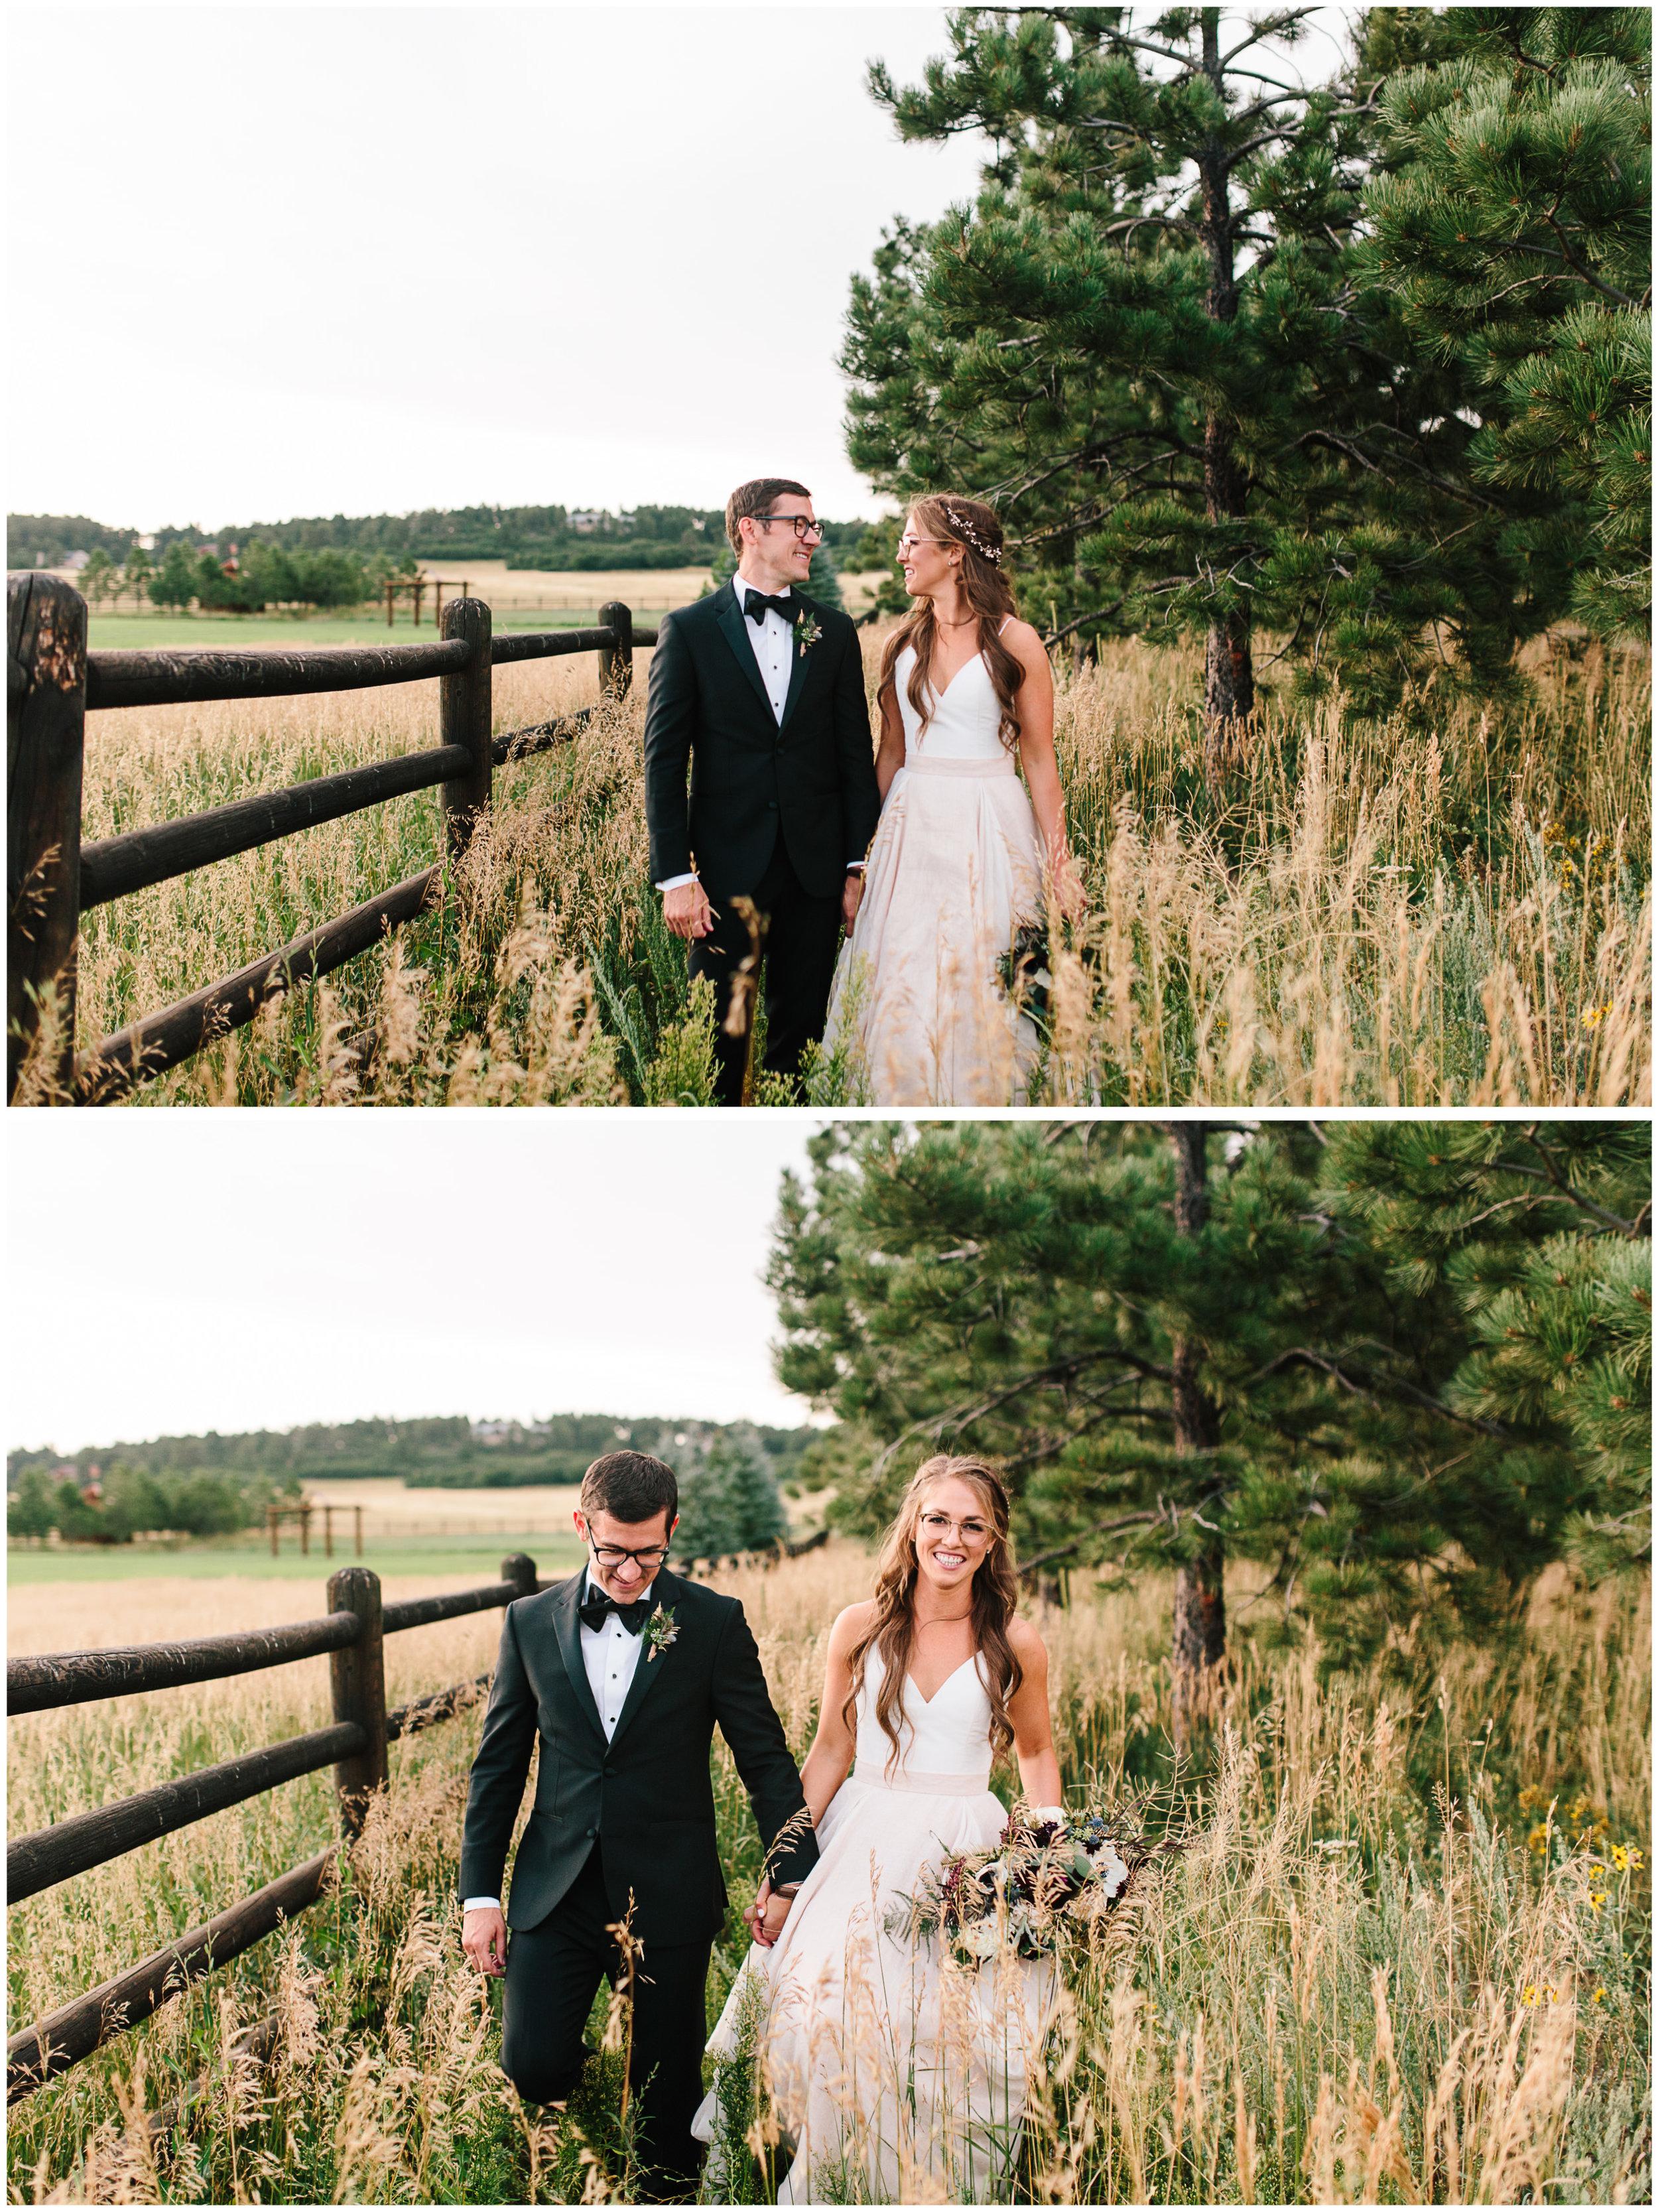 spruce_mountain_ranch_wedding_64.jpg